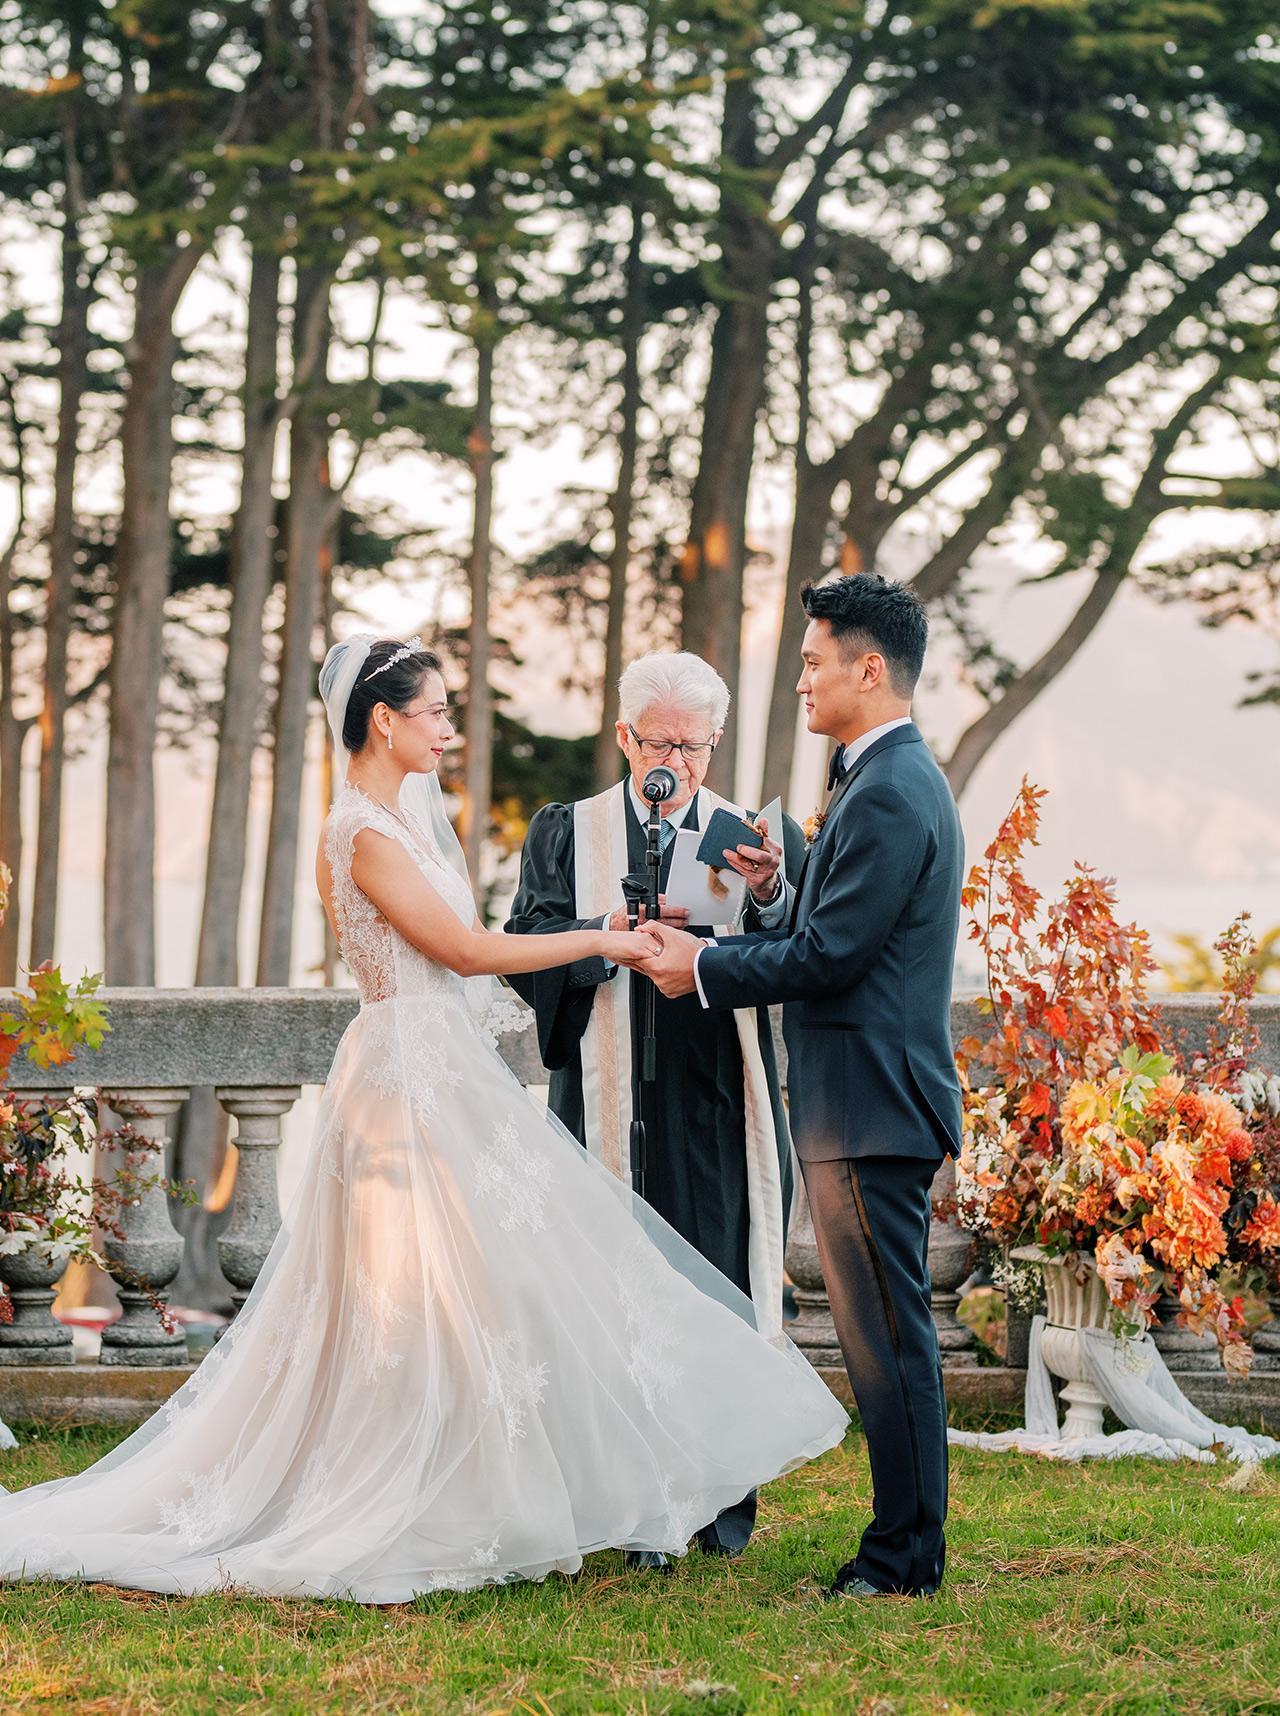 bride groom wedding ceremony vows outdoors